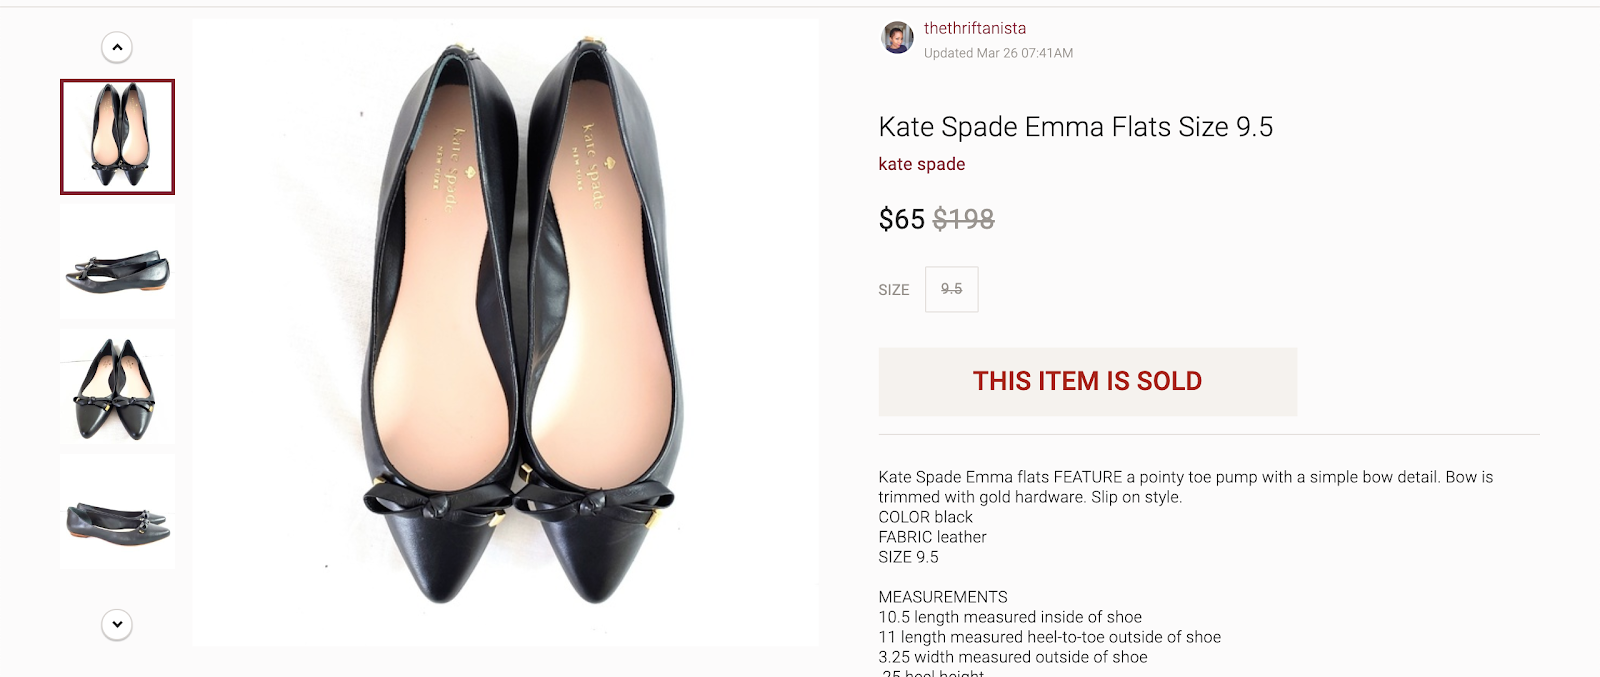 flipping thrift store finds on ebay, poshmark, and etsy